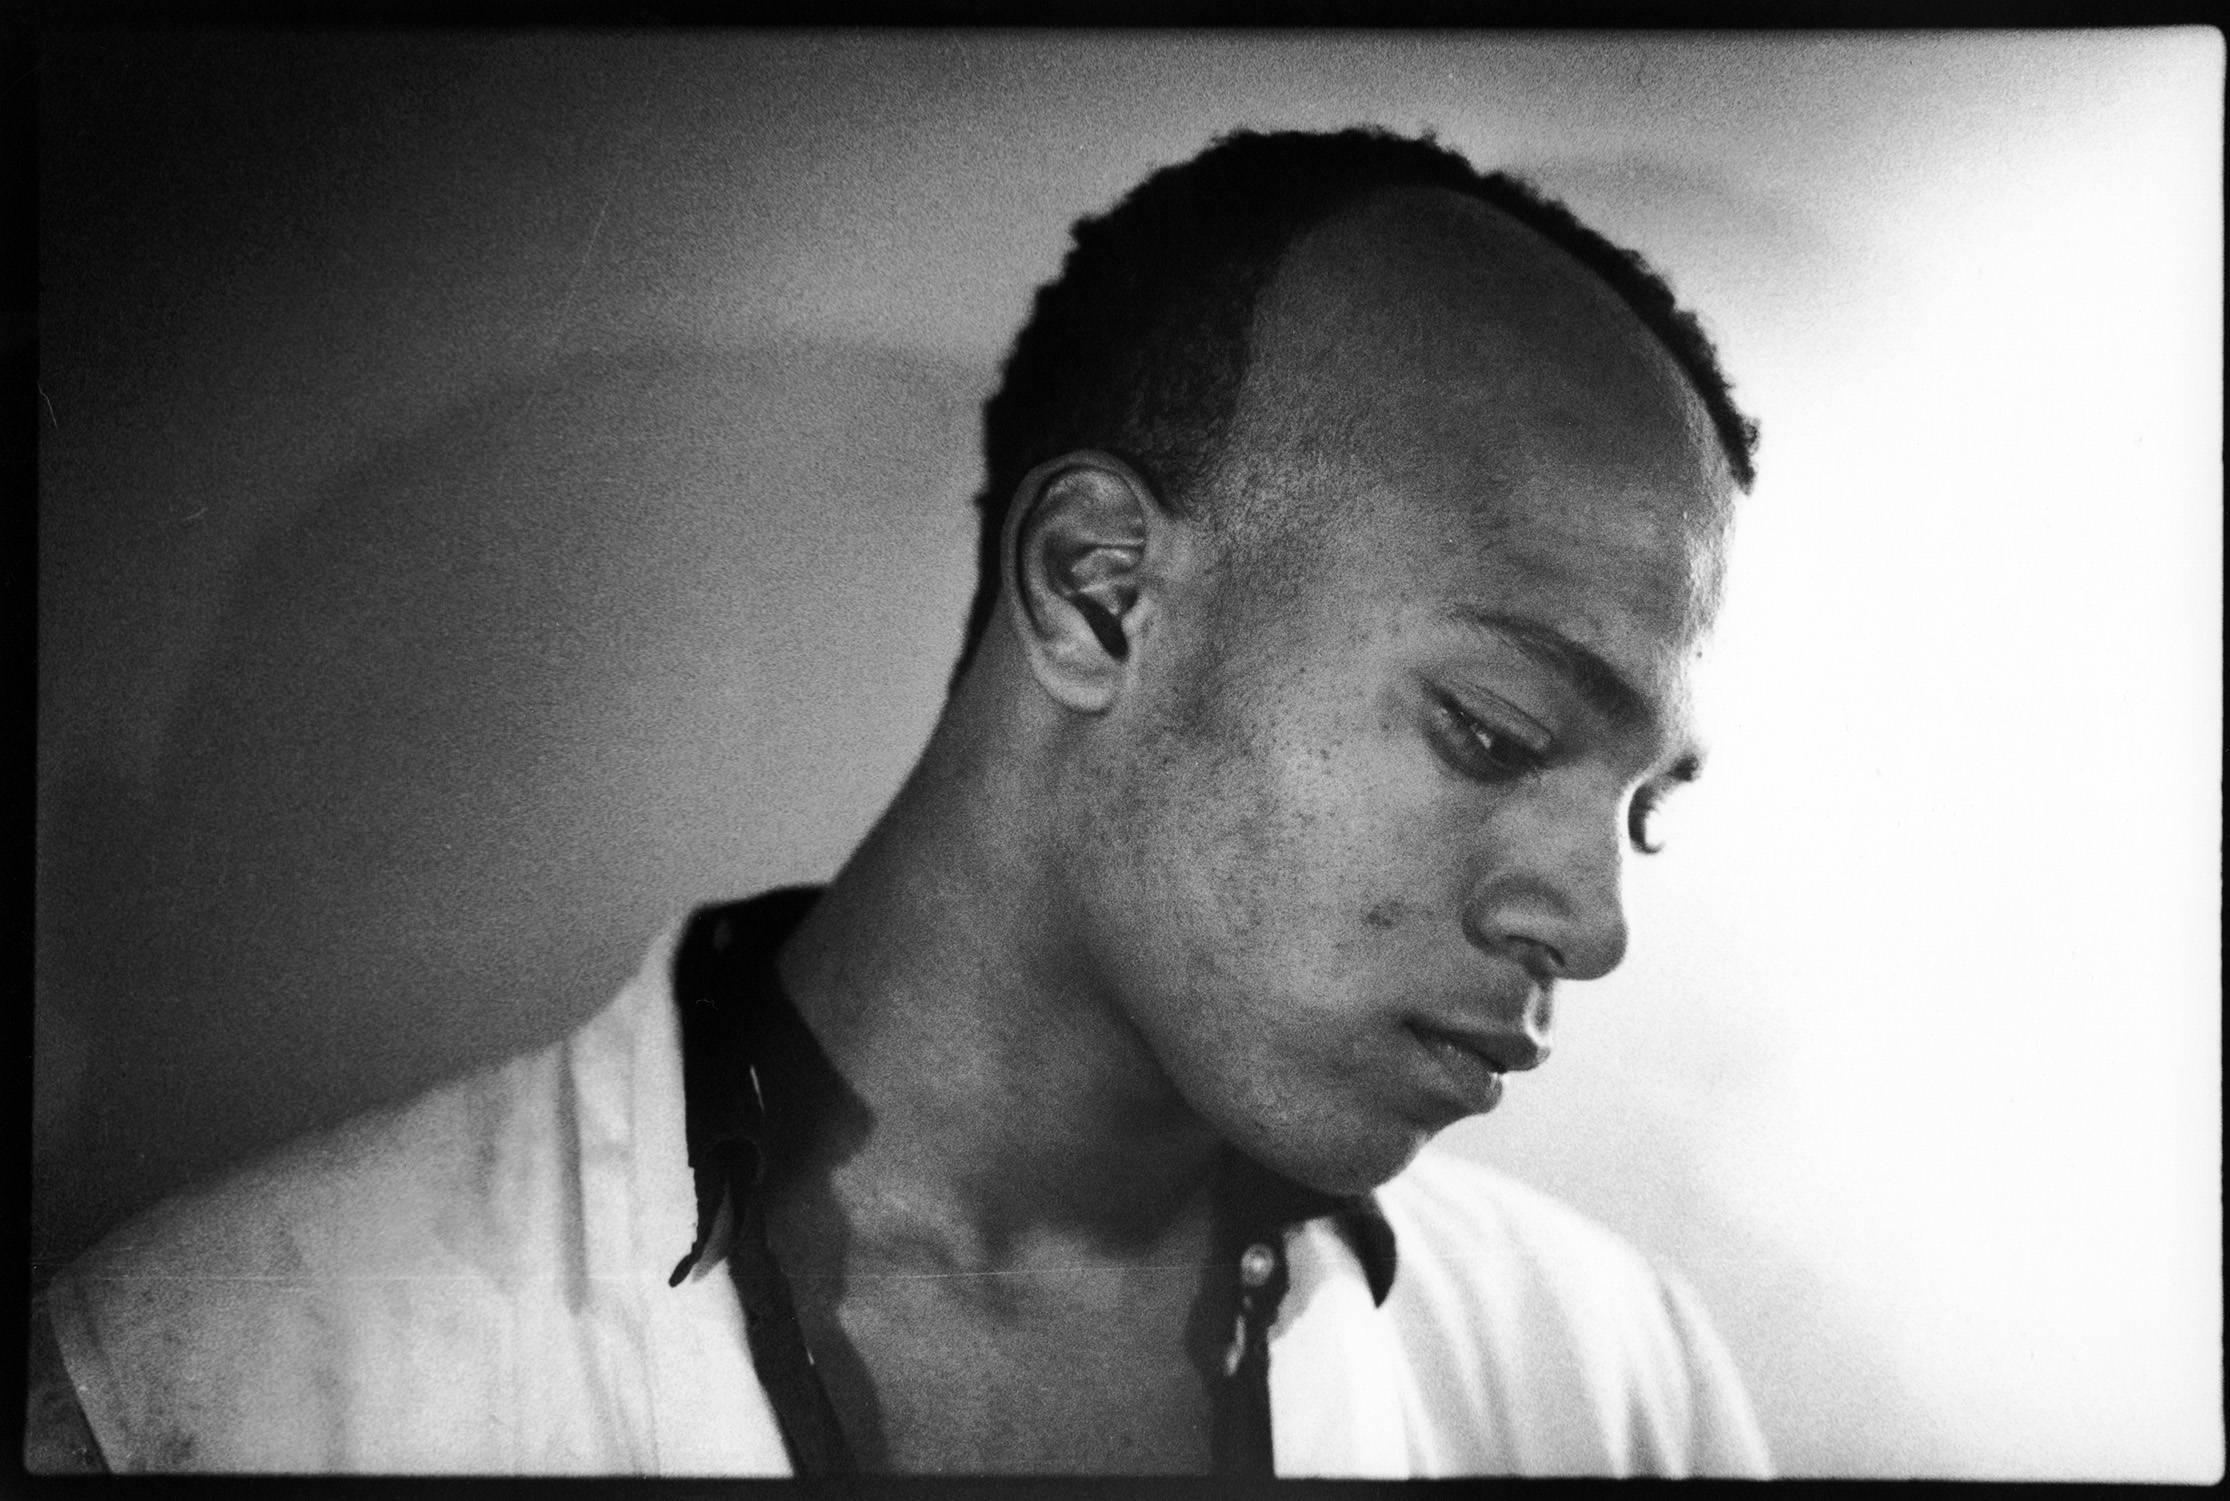 Jean-Michel Basquiat photograph 1979 (Nick Taylor of Gray)